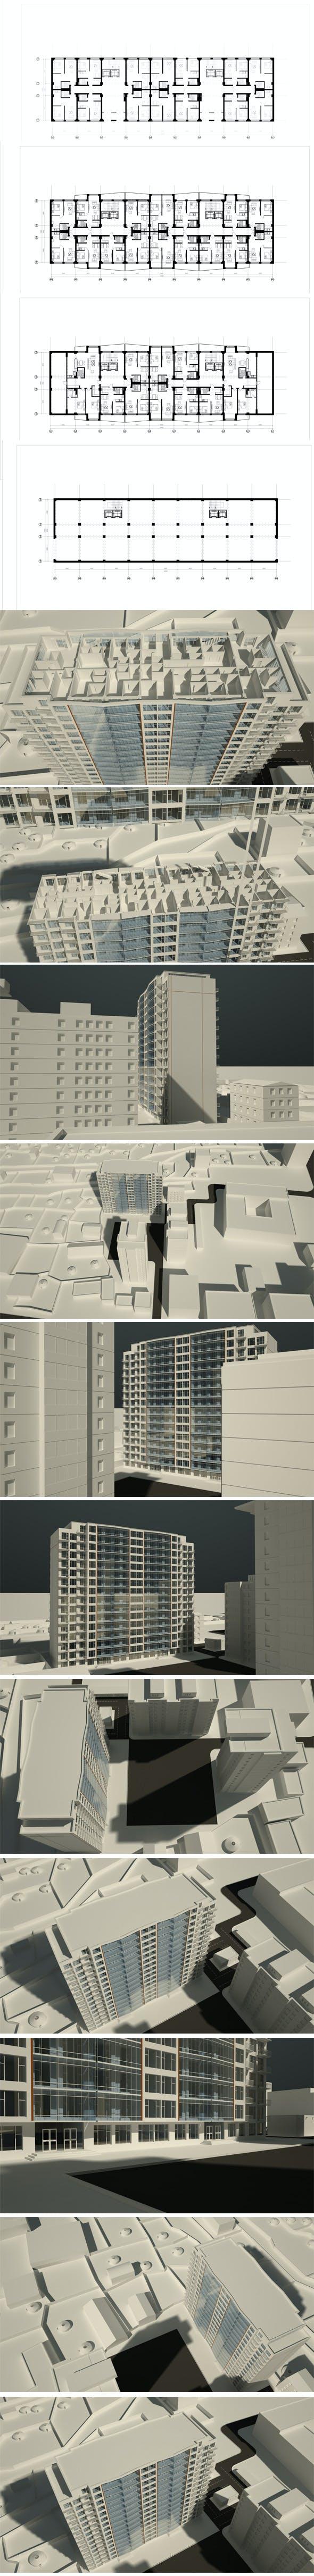 Apartment - 3DOcean Item for Sale